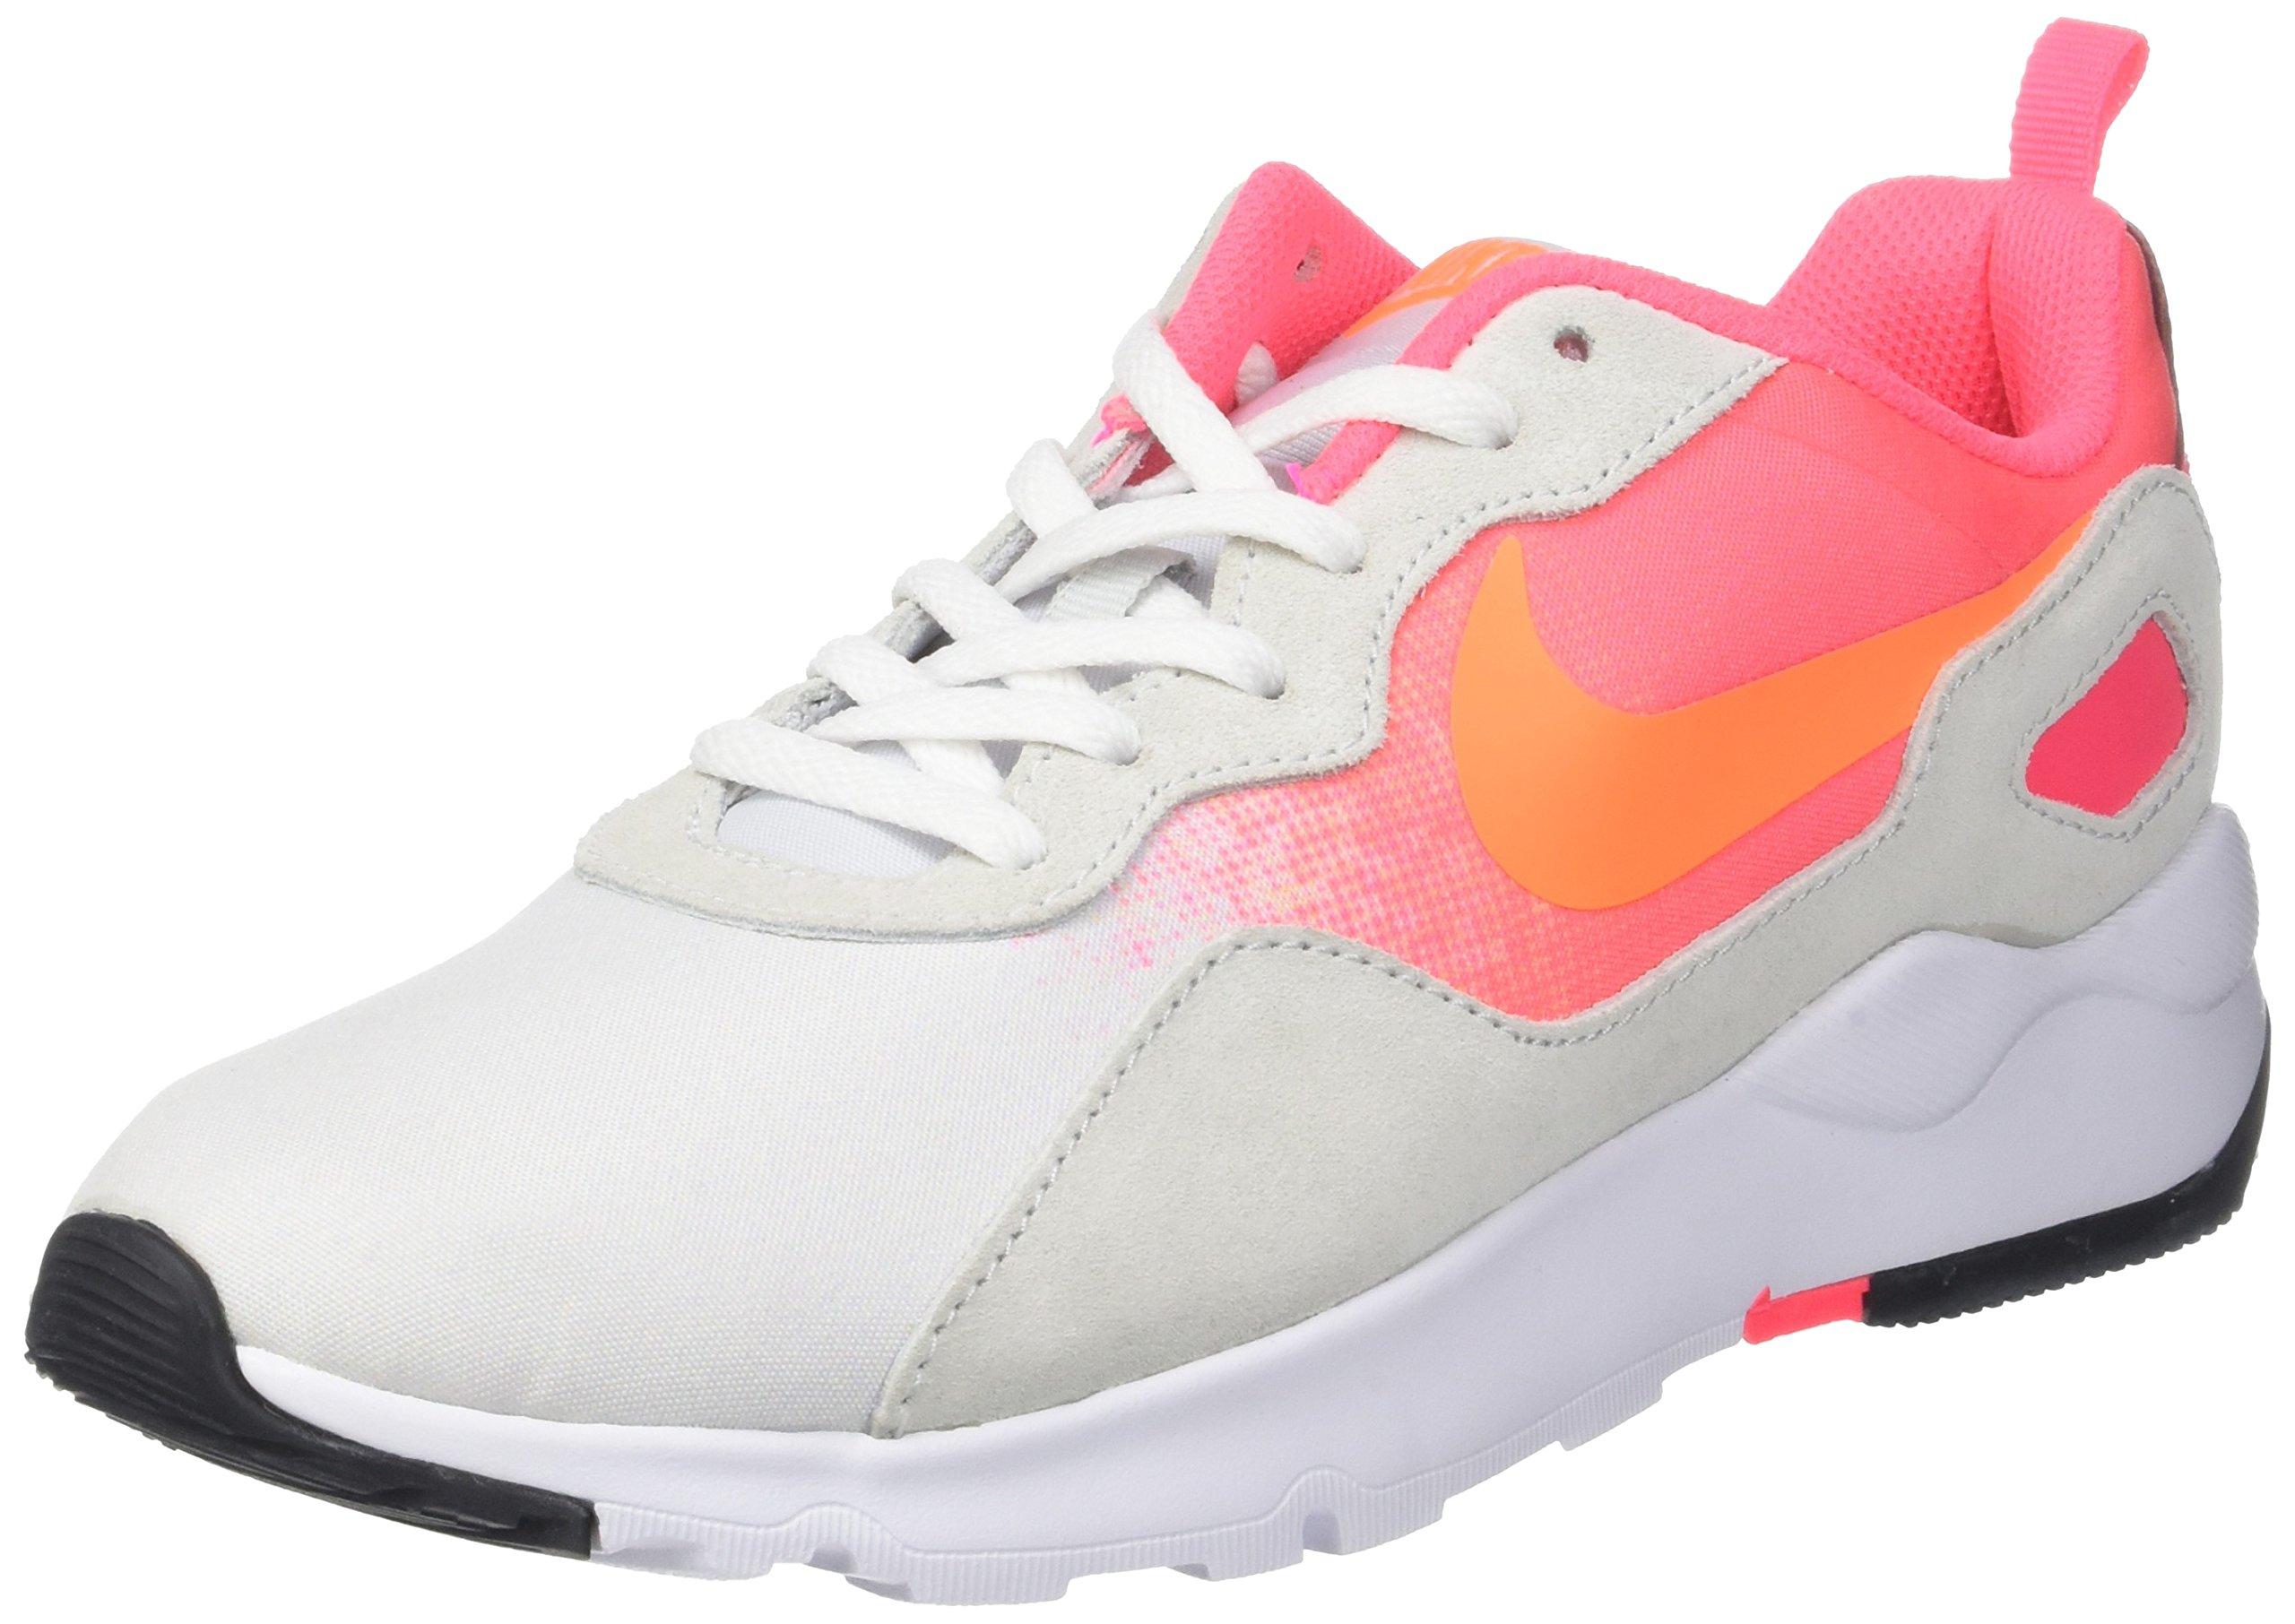 Nike Eu 882267Sneakers FemmeMulticoloreplatino rosa Basses mayo40 ID9EeH2YW